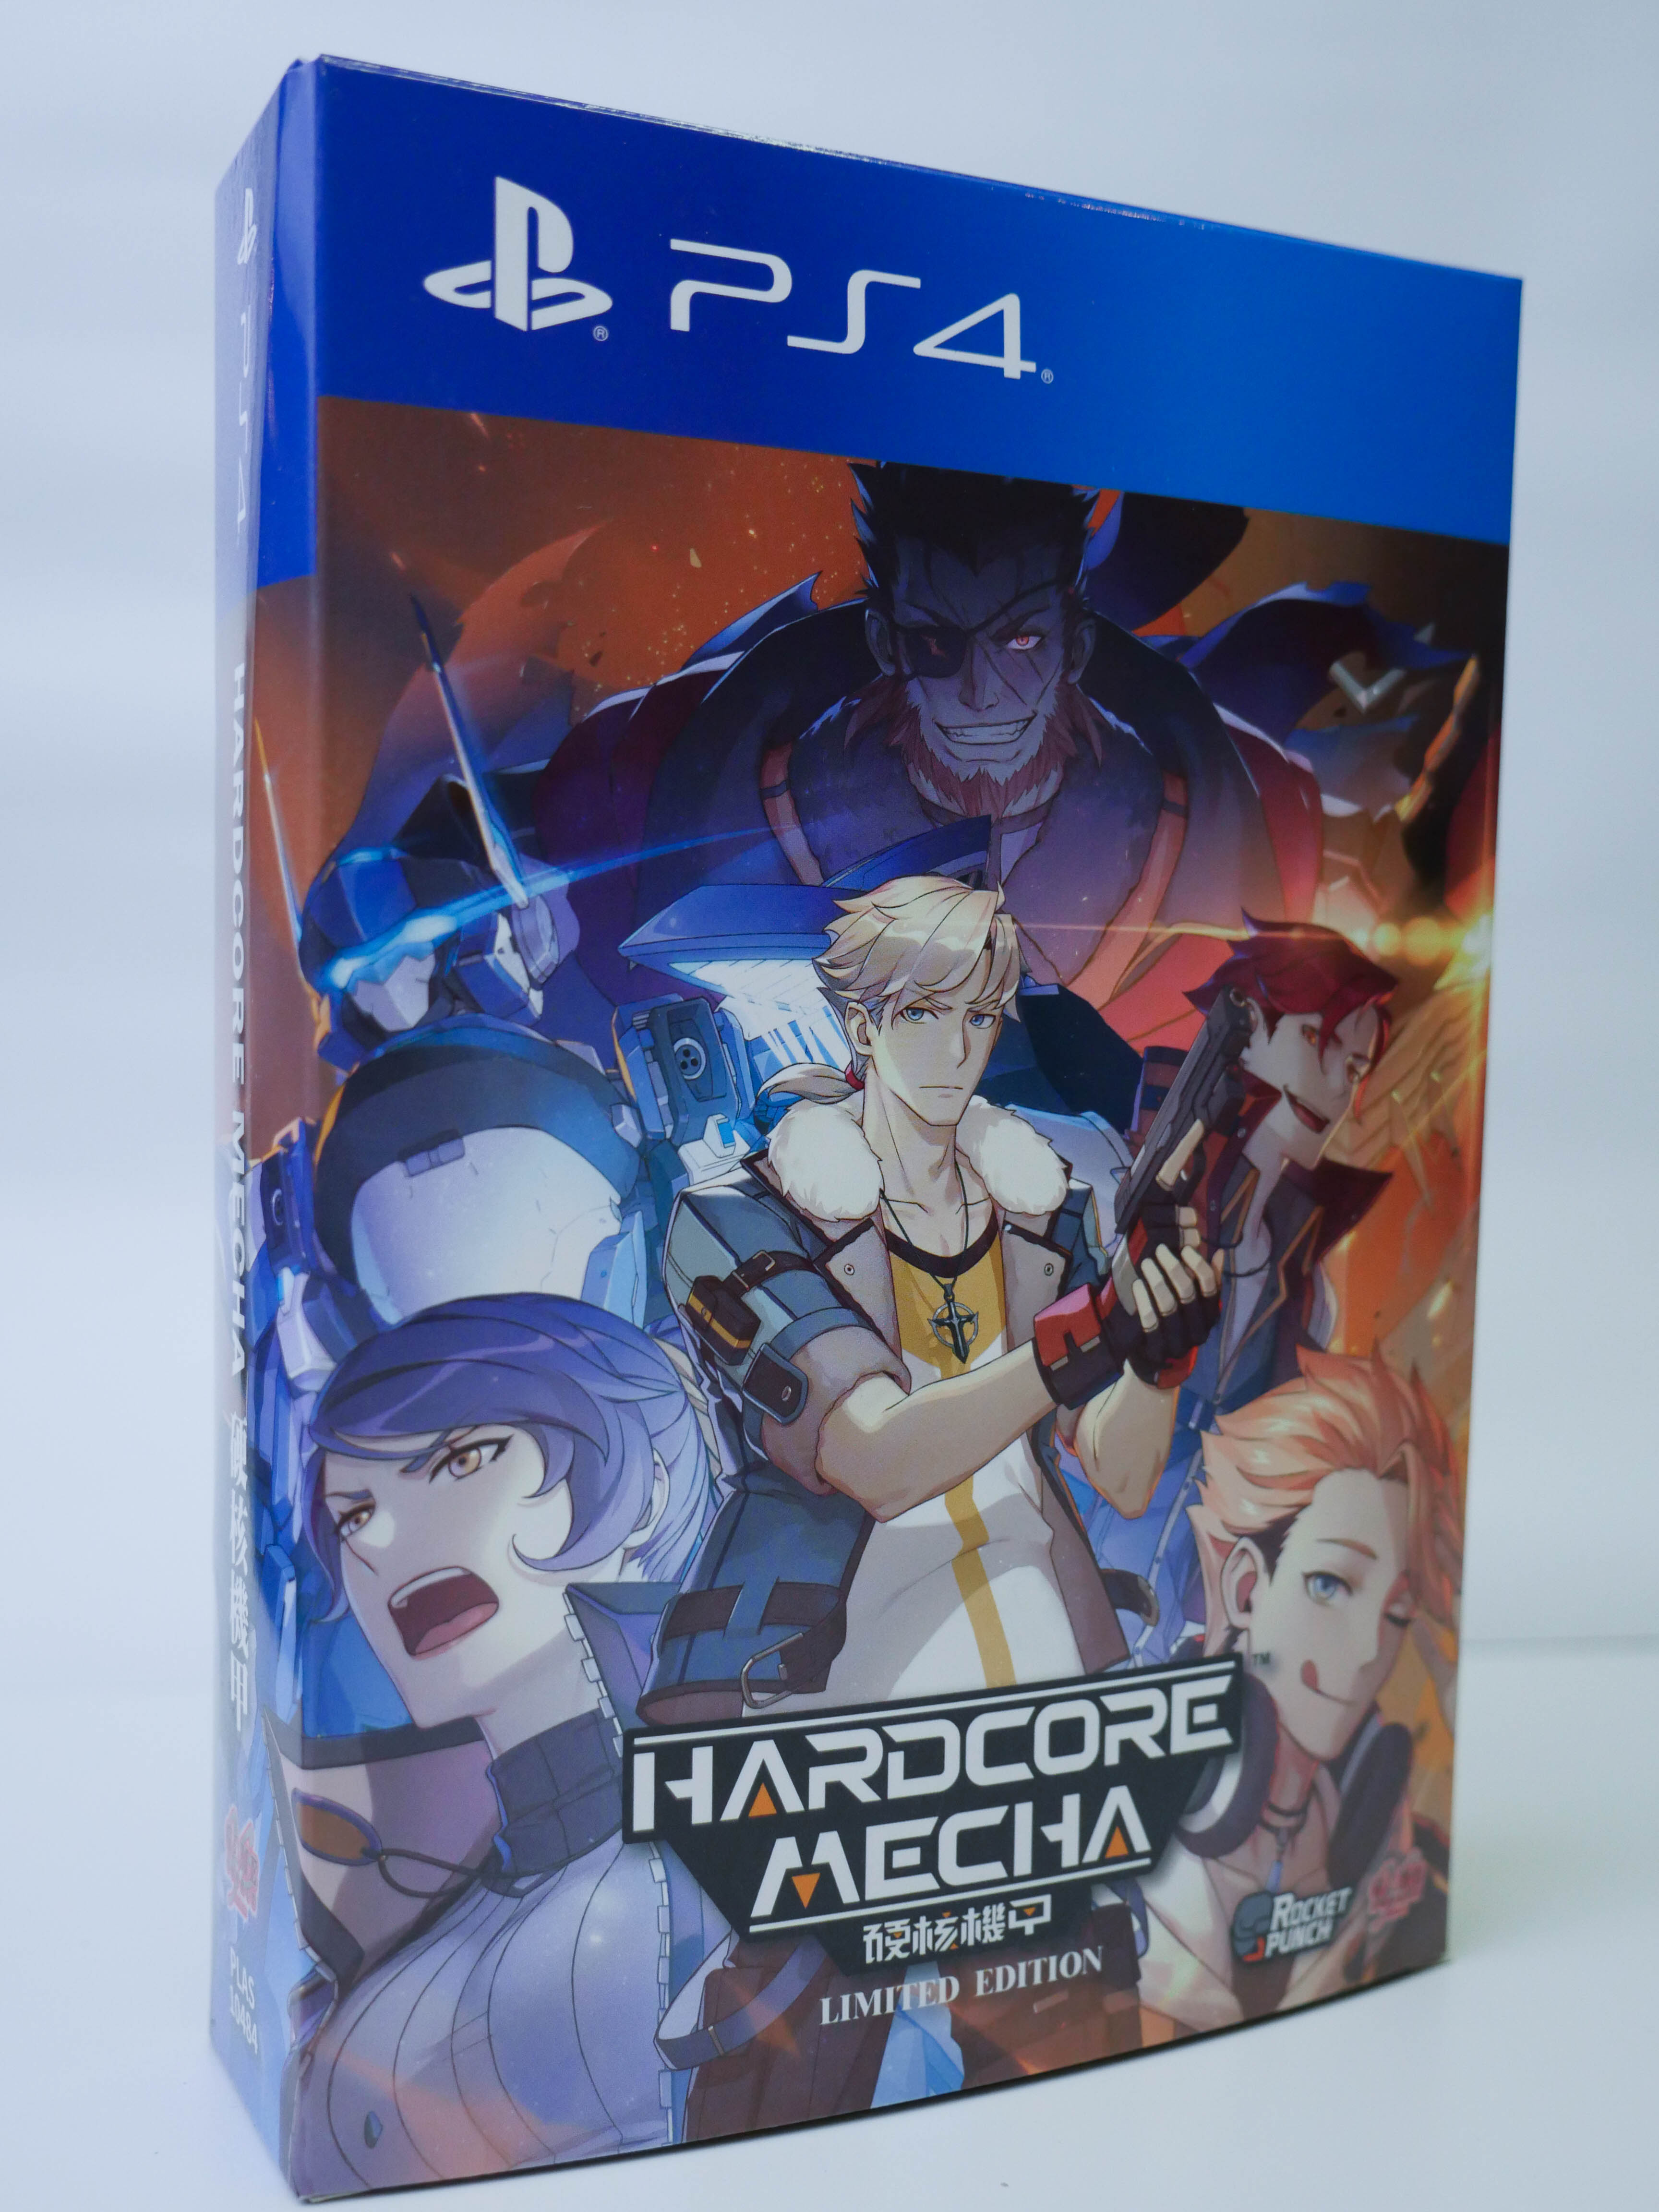 2D横向射击游戏 《硬核机甲》PS4版本正式上市